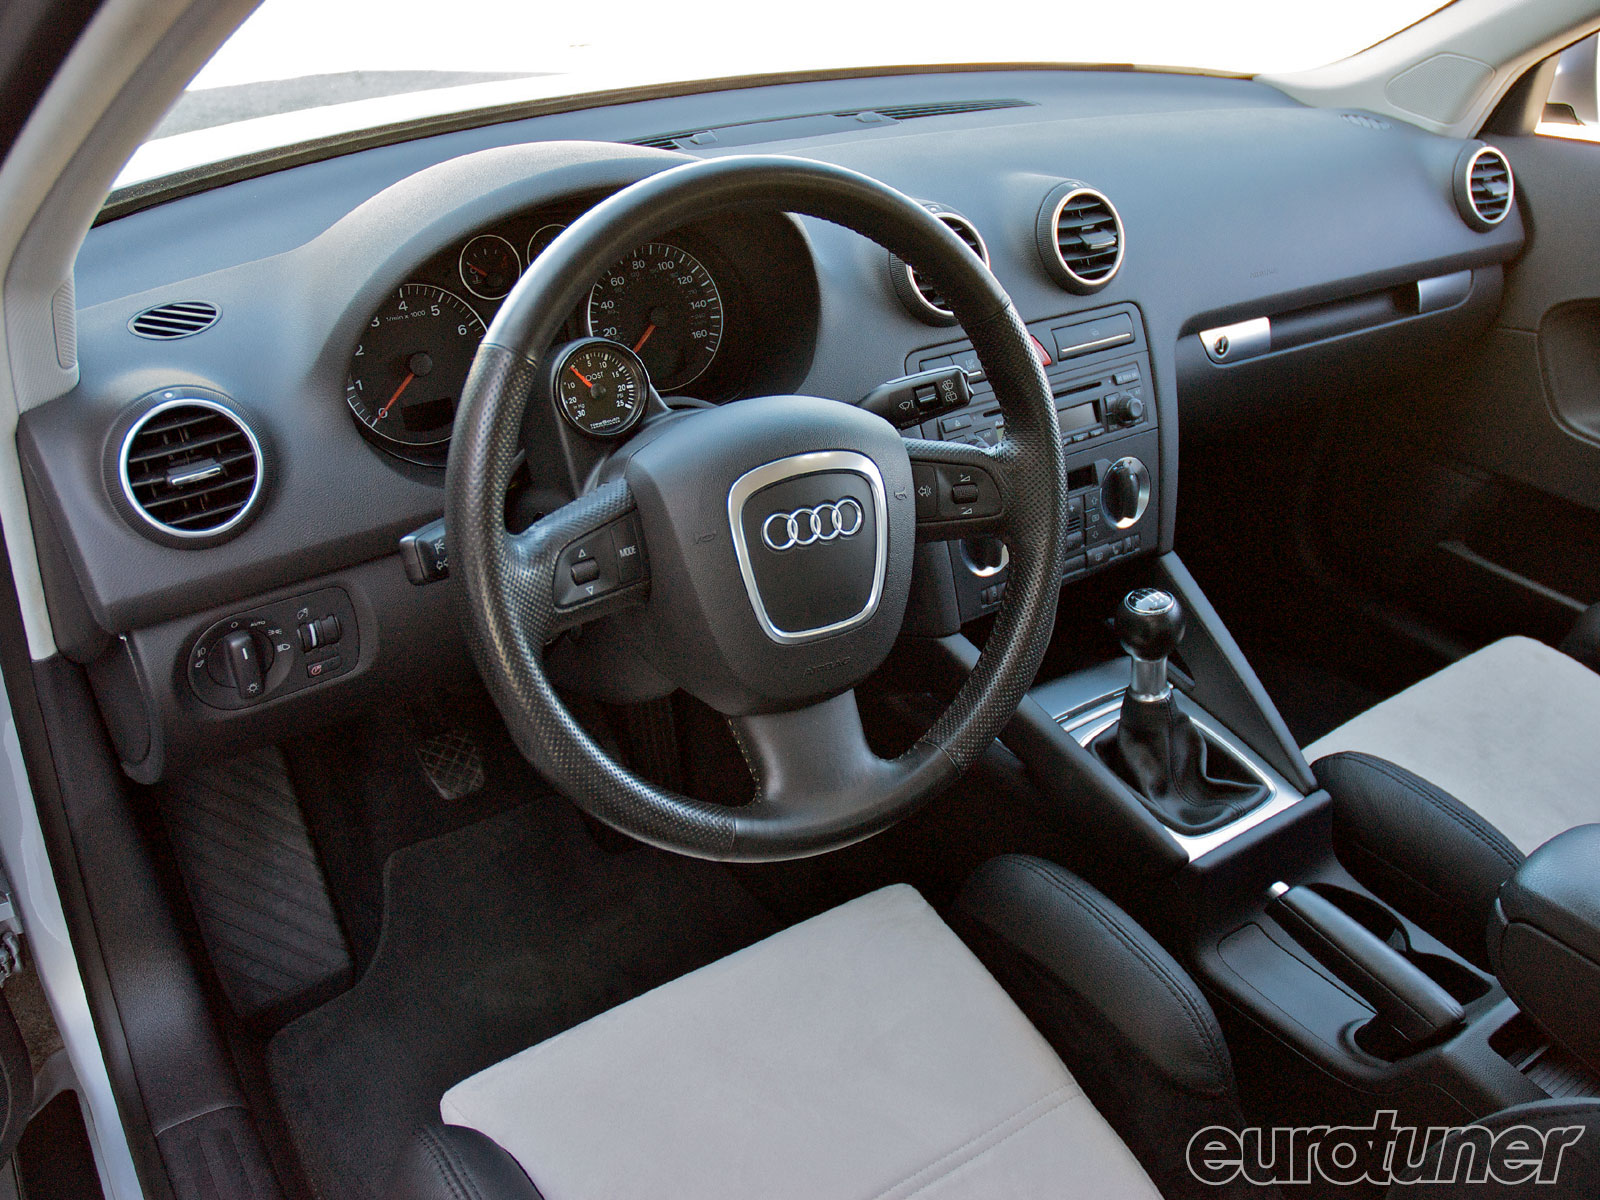 2006 Audi A3 Image 17